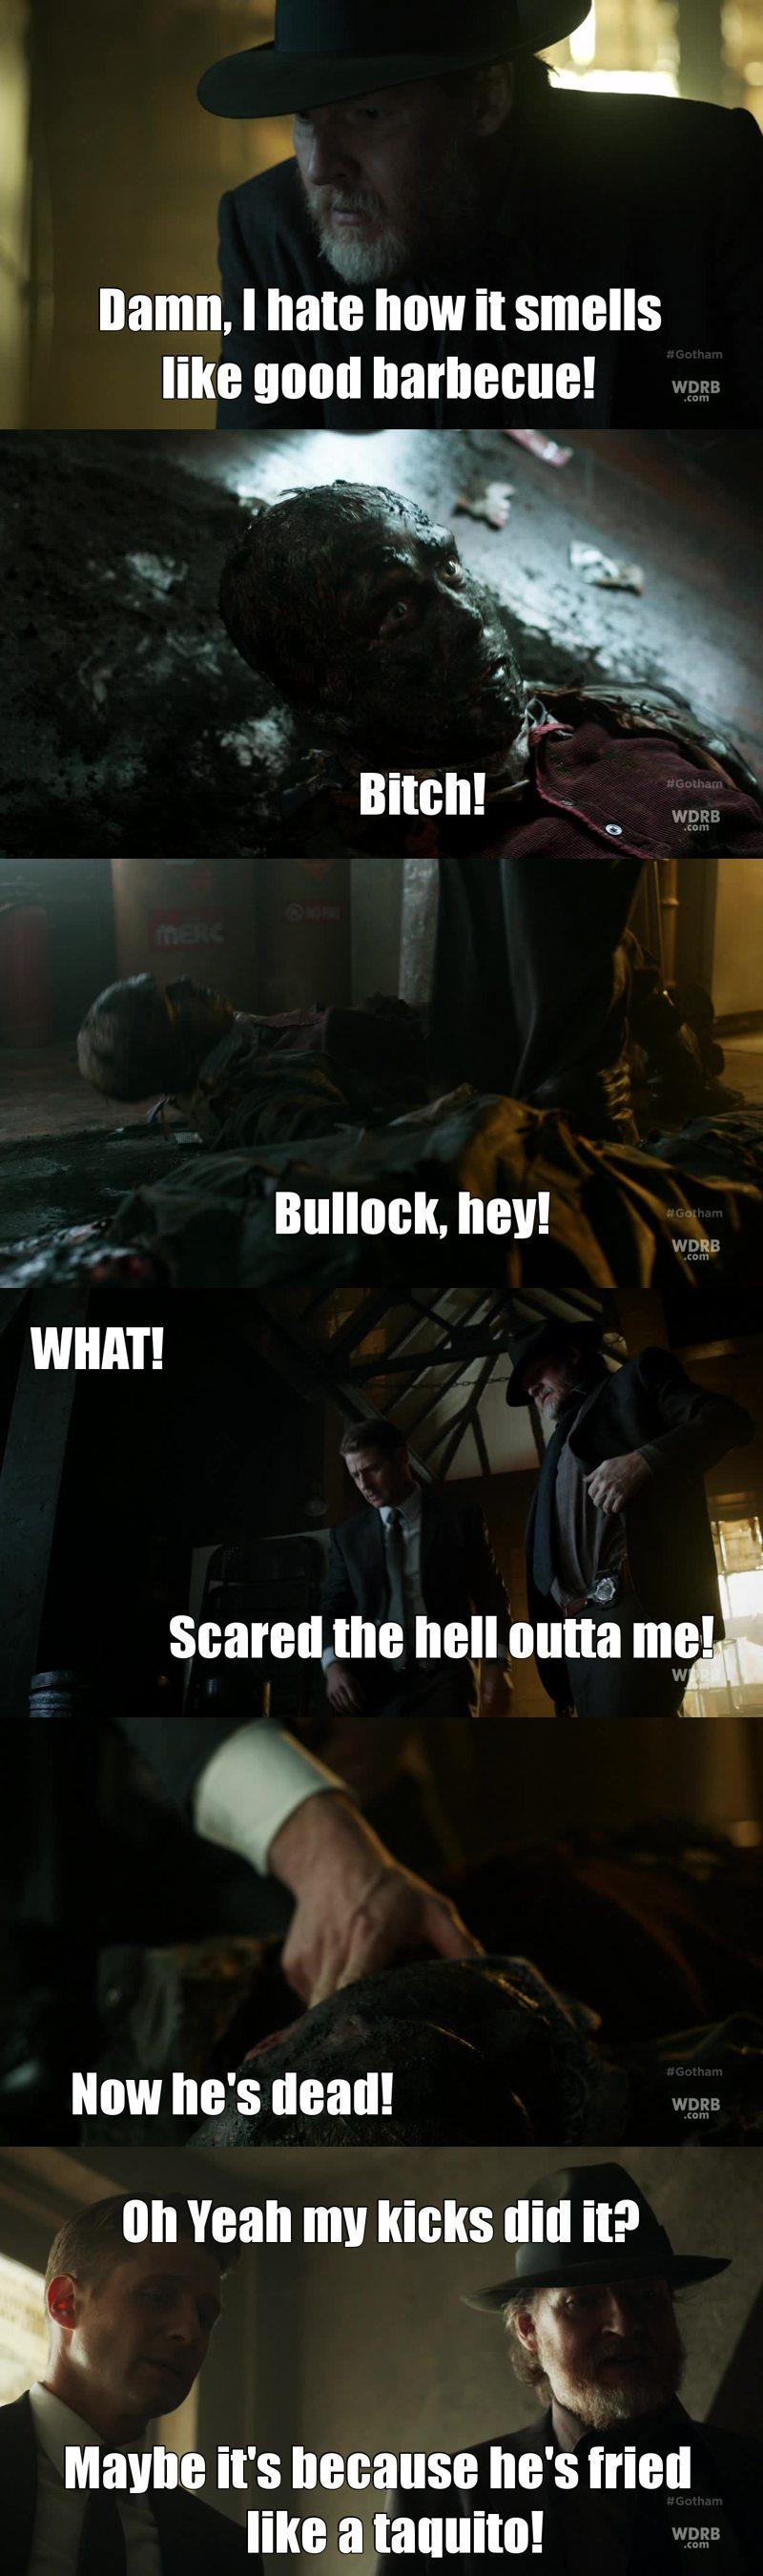 Detective Harvey Bullock again and again making me giggle!